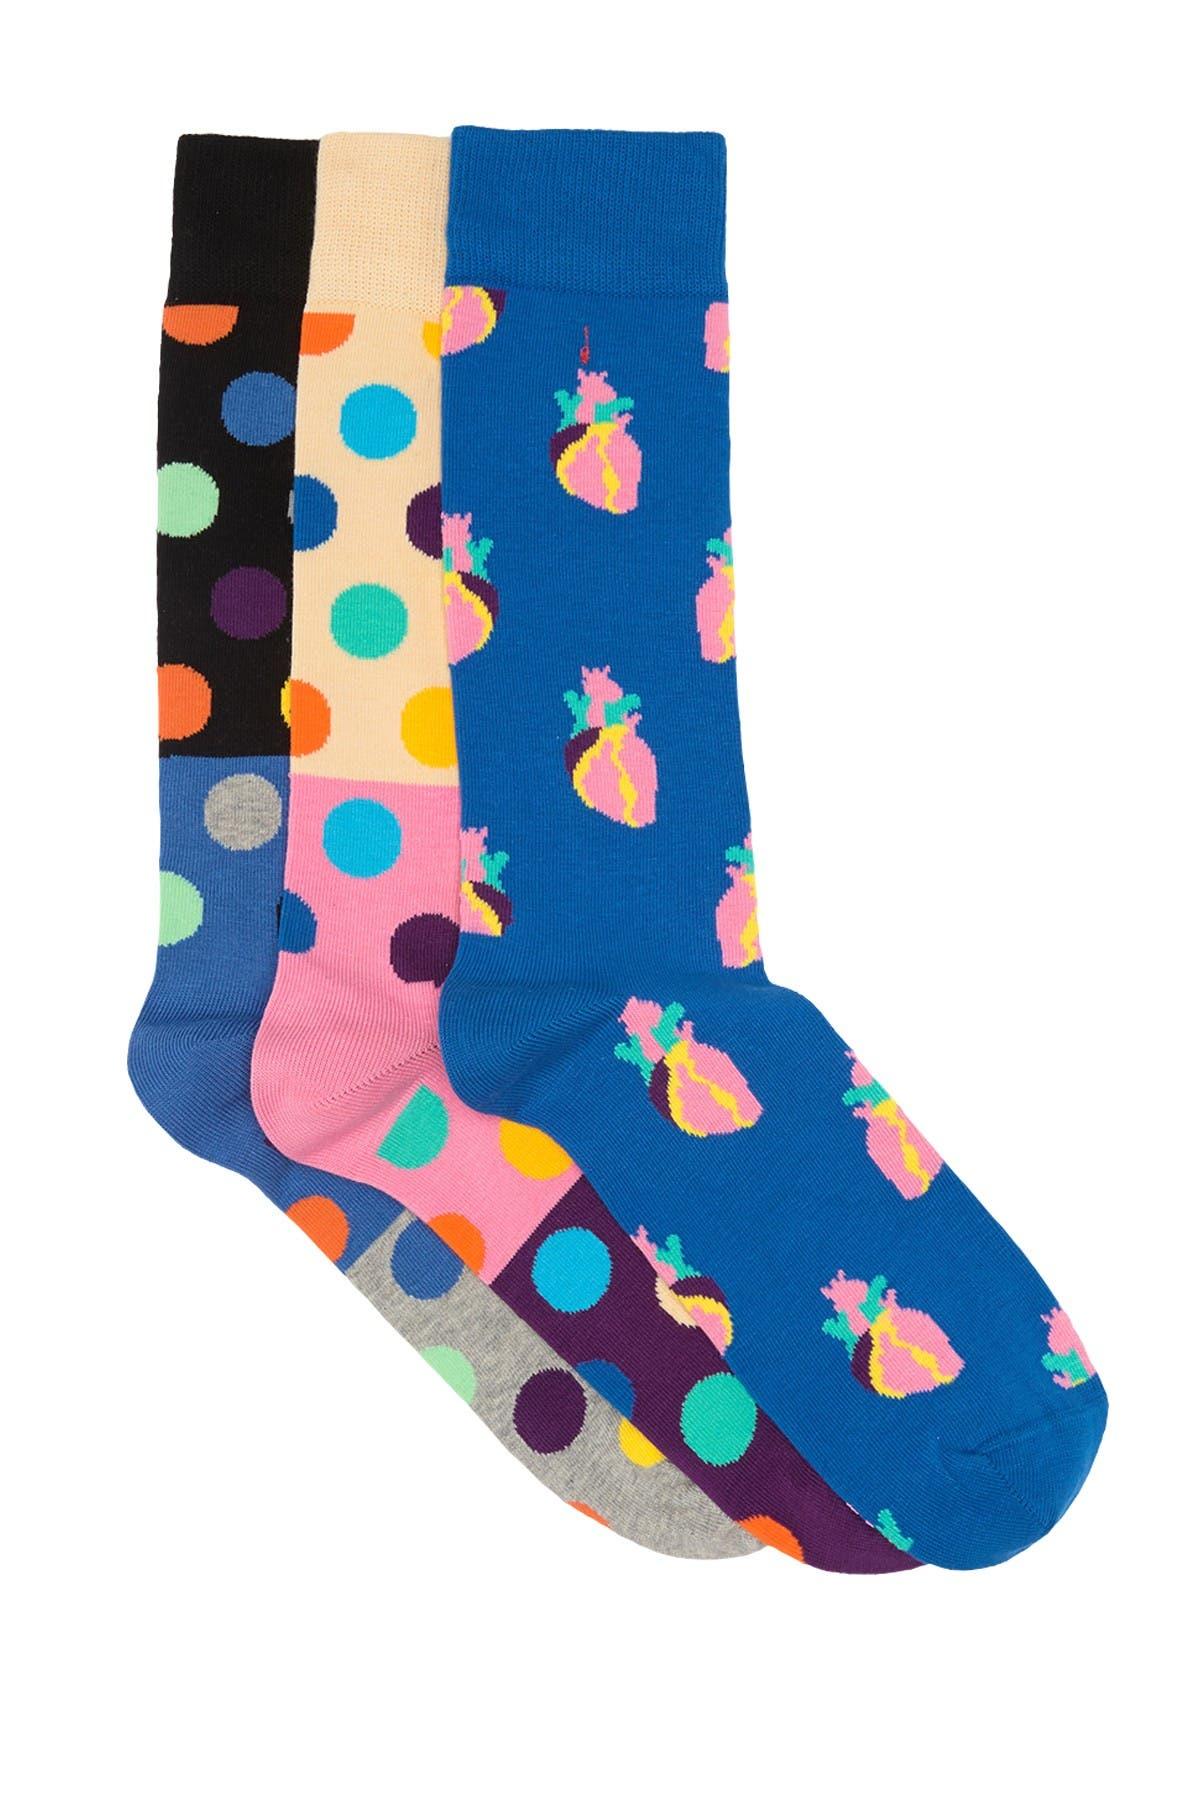 Image of Happy Socks True Love Crew Socks - Pack of 3